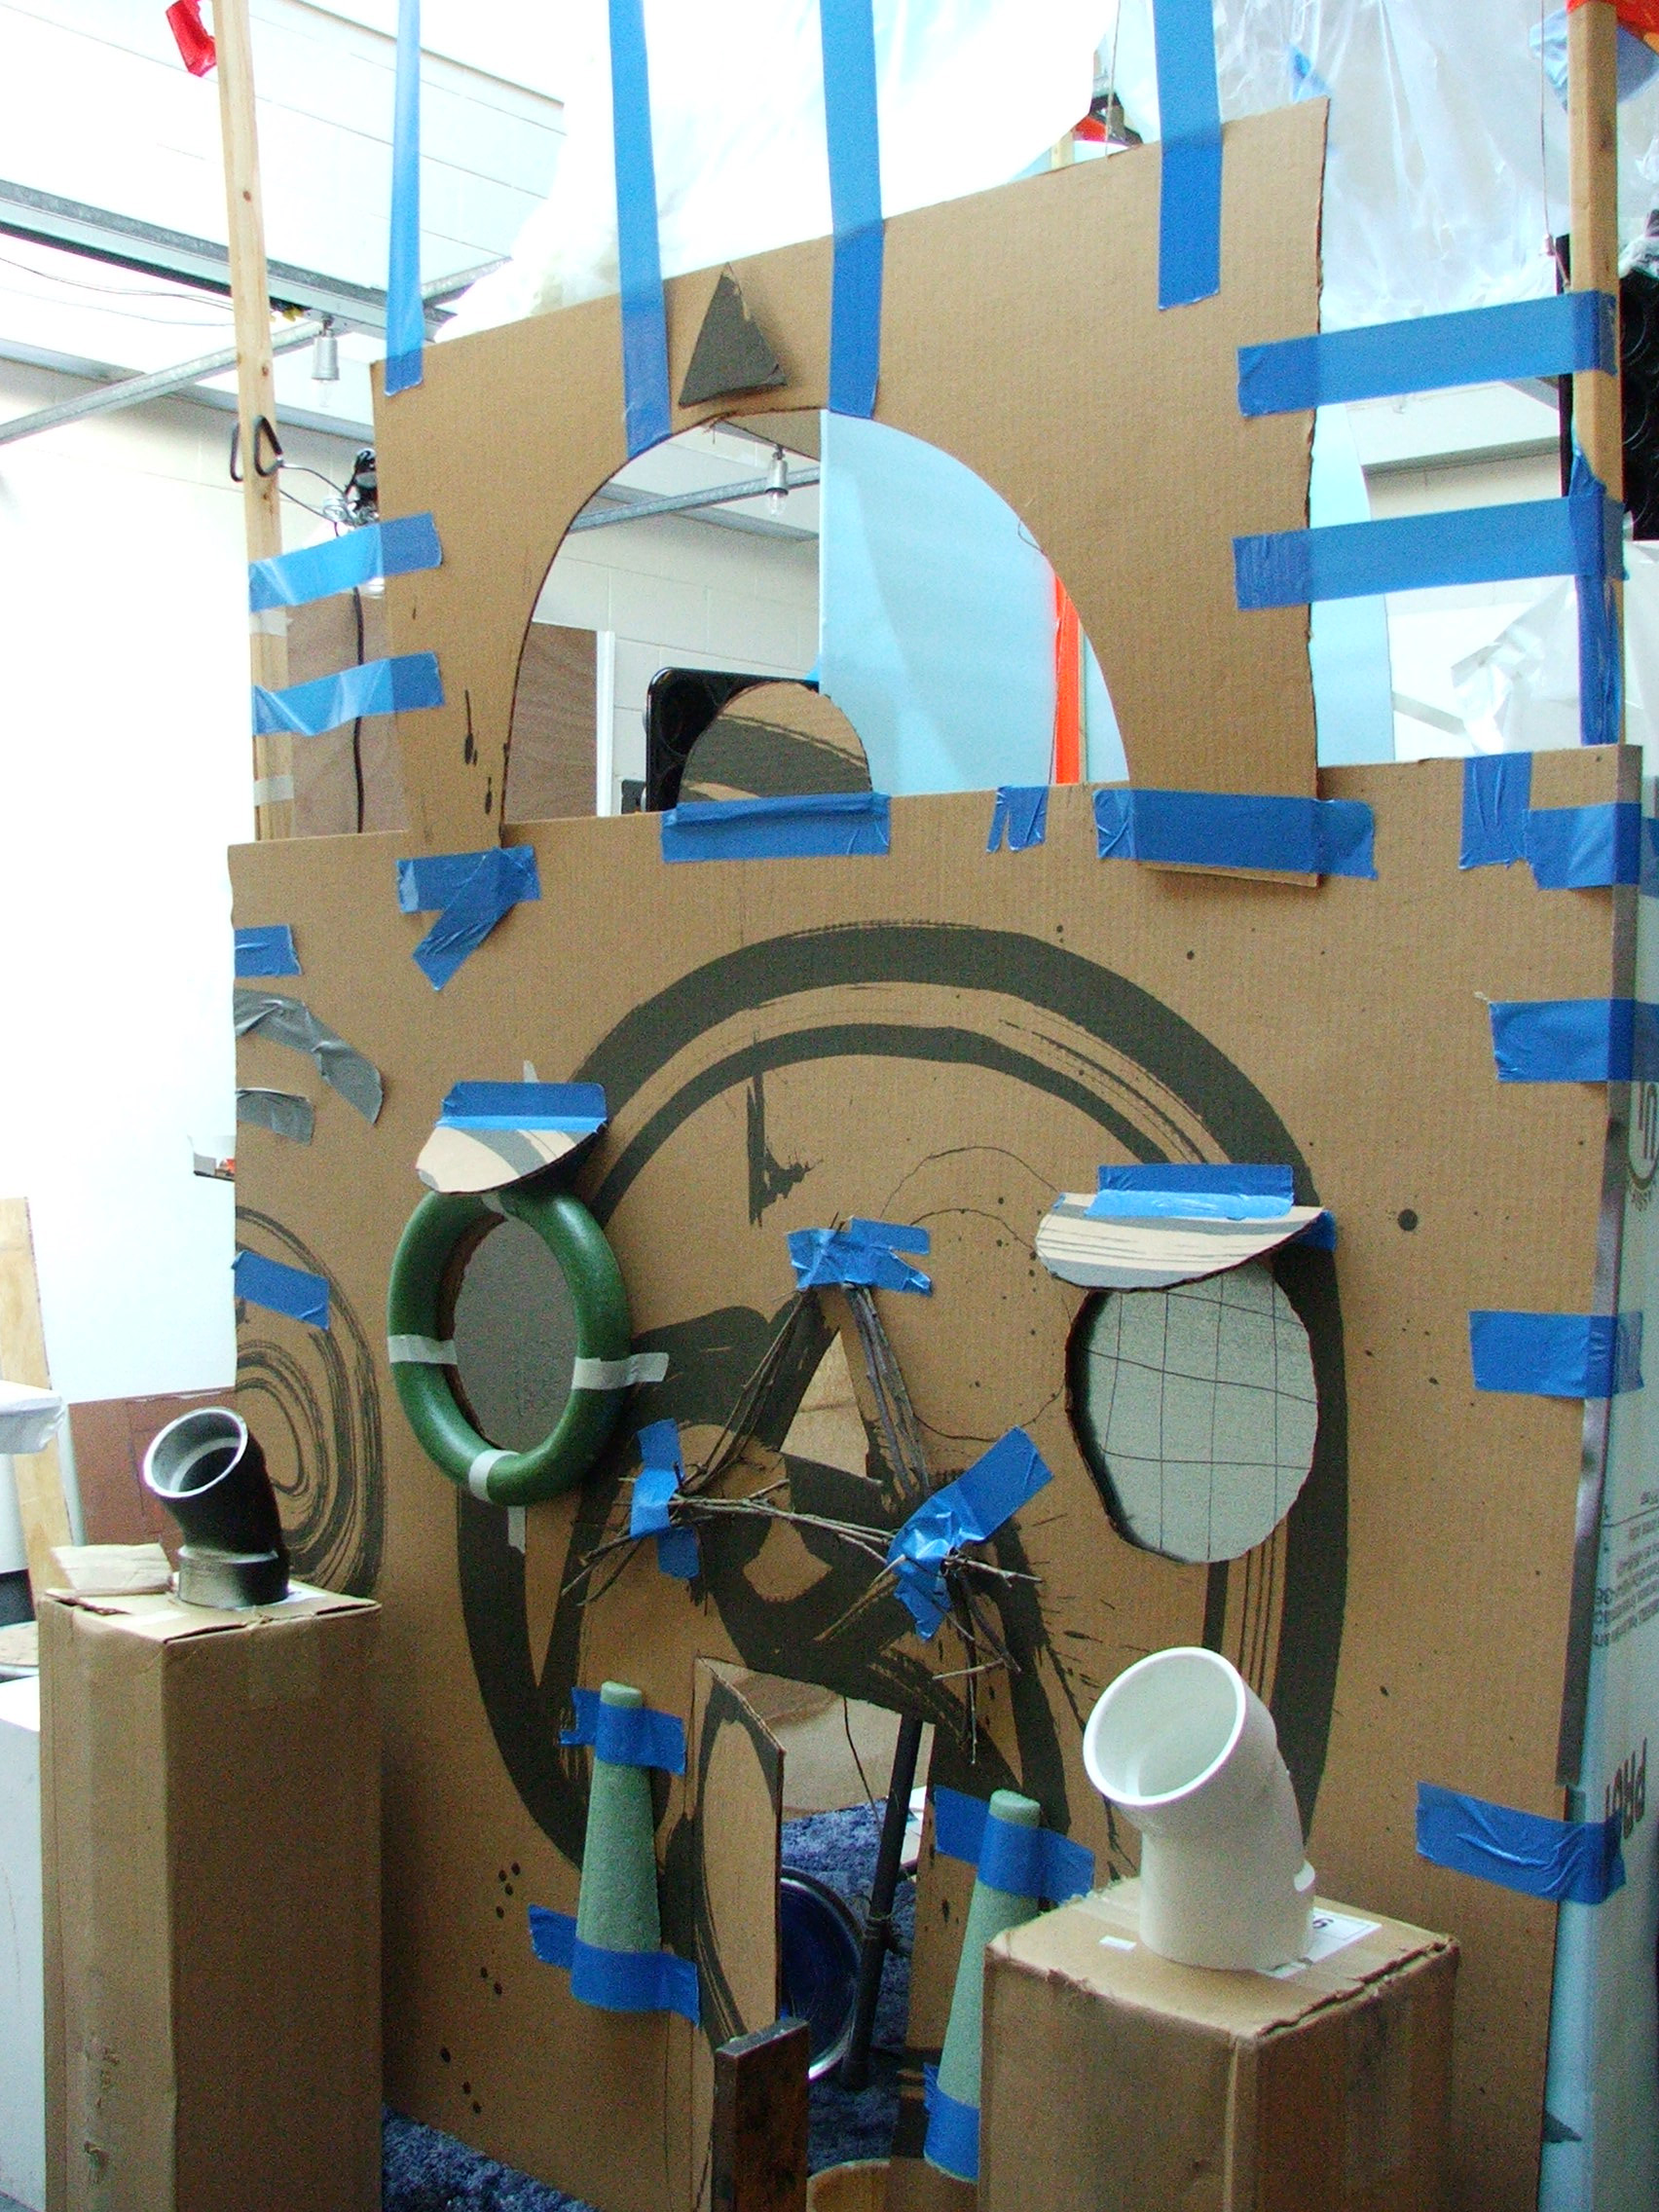 garbagestructure.jpg